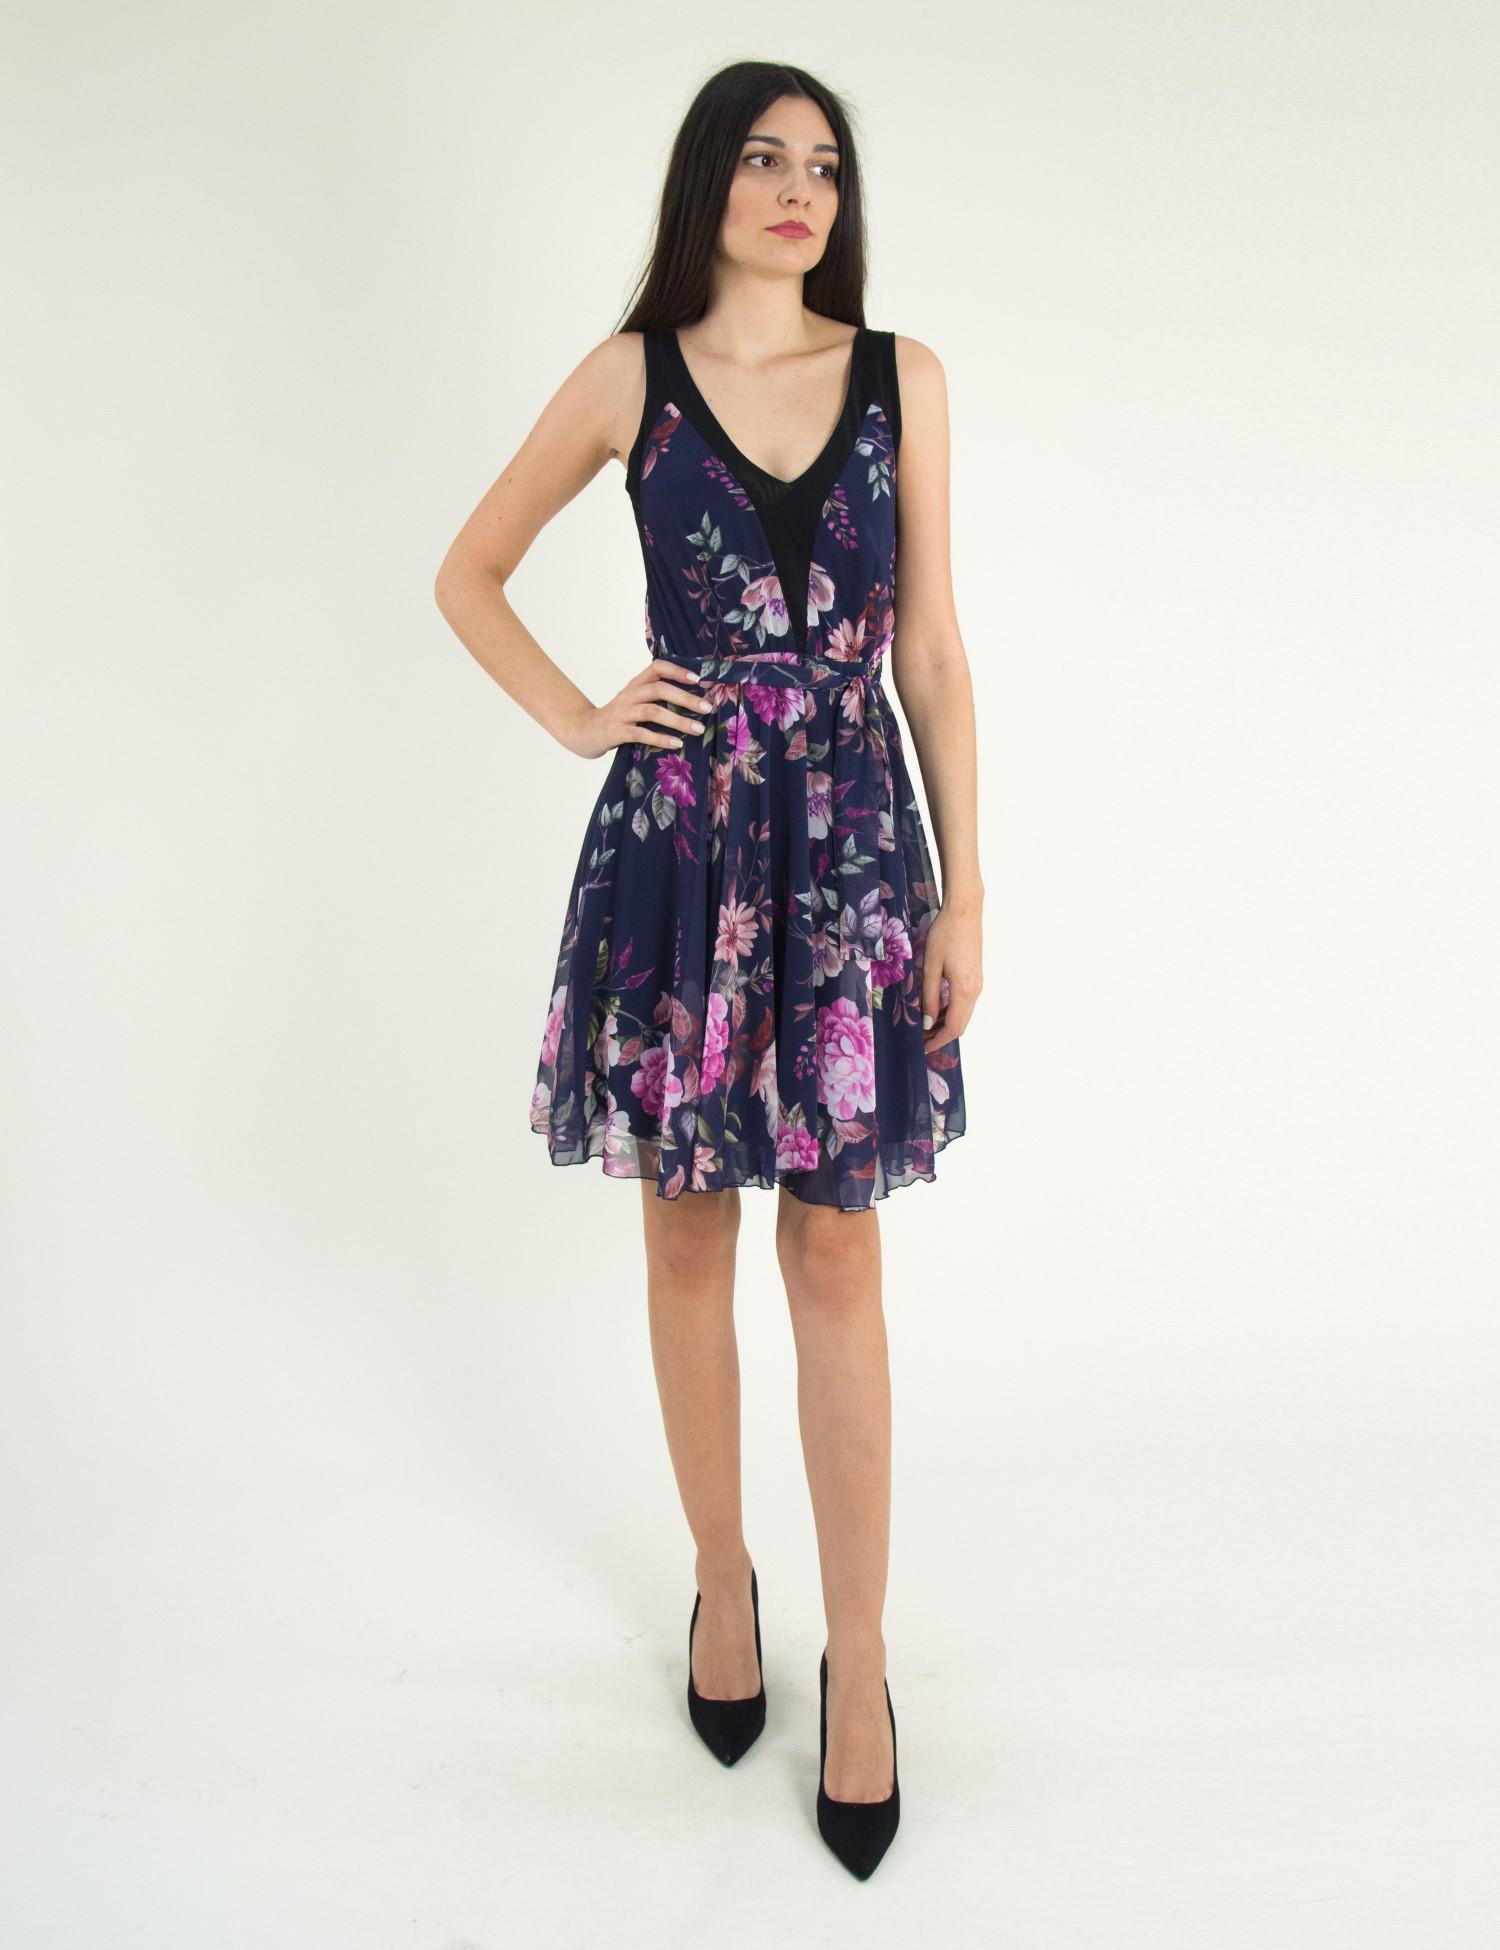 d1192c9d7c7 Γυναικείο μπλε φλοράλ αμάνικο φόρεμα κλος τούλι 8316275G